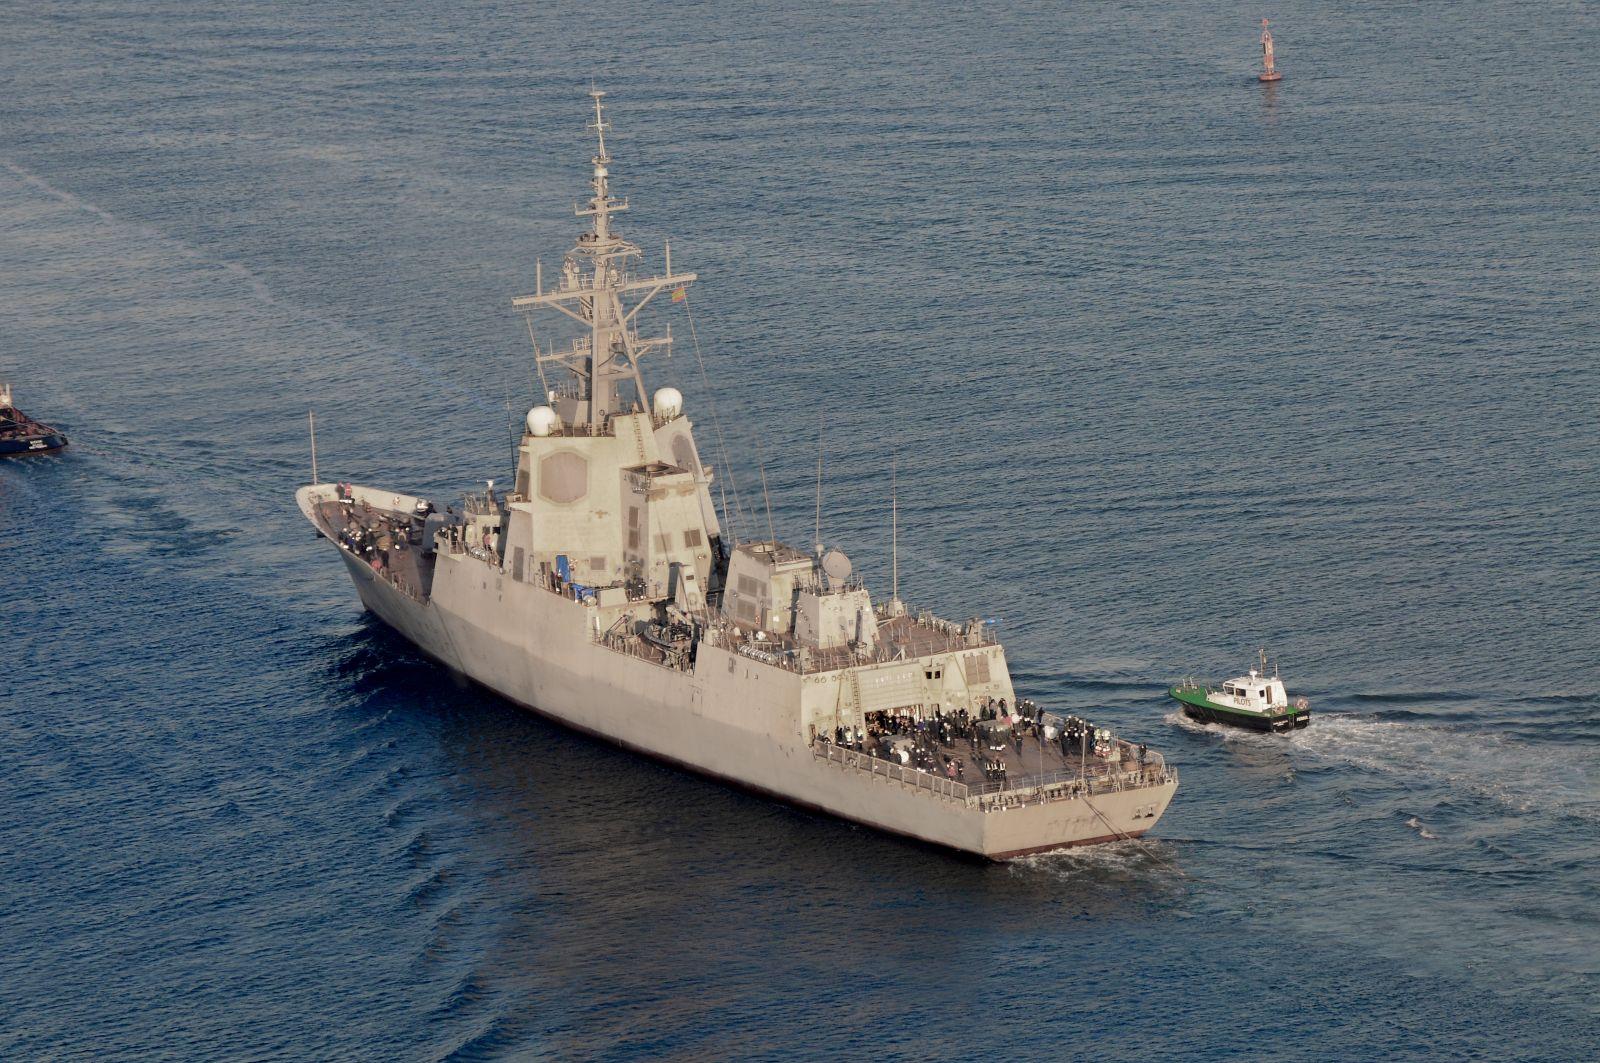 Alvaro de Bazan-class frigate, Cristobal Colon (F-105), for the Spanish Navy